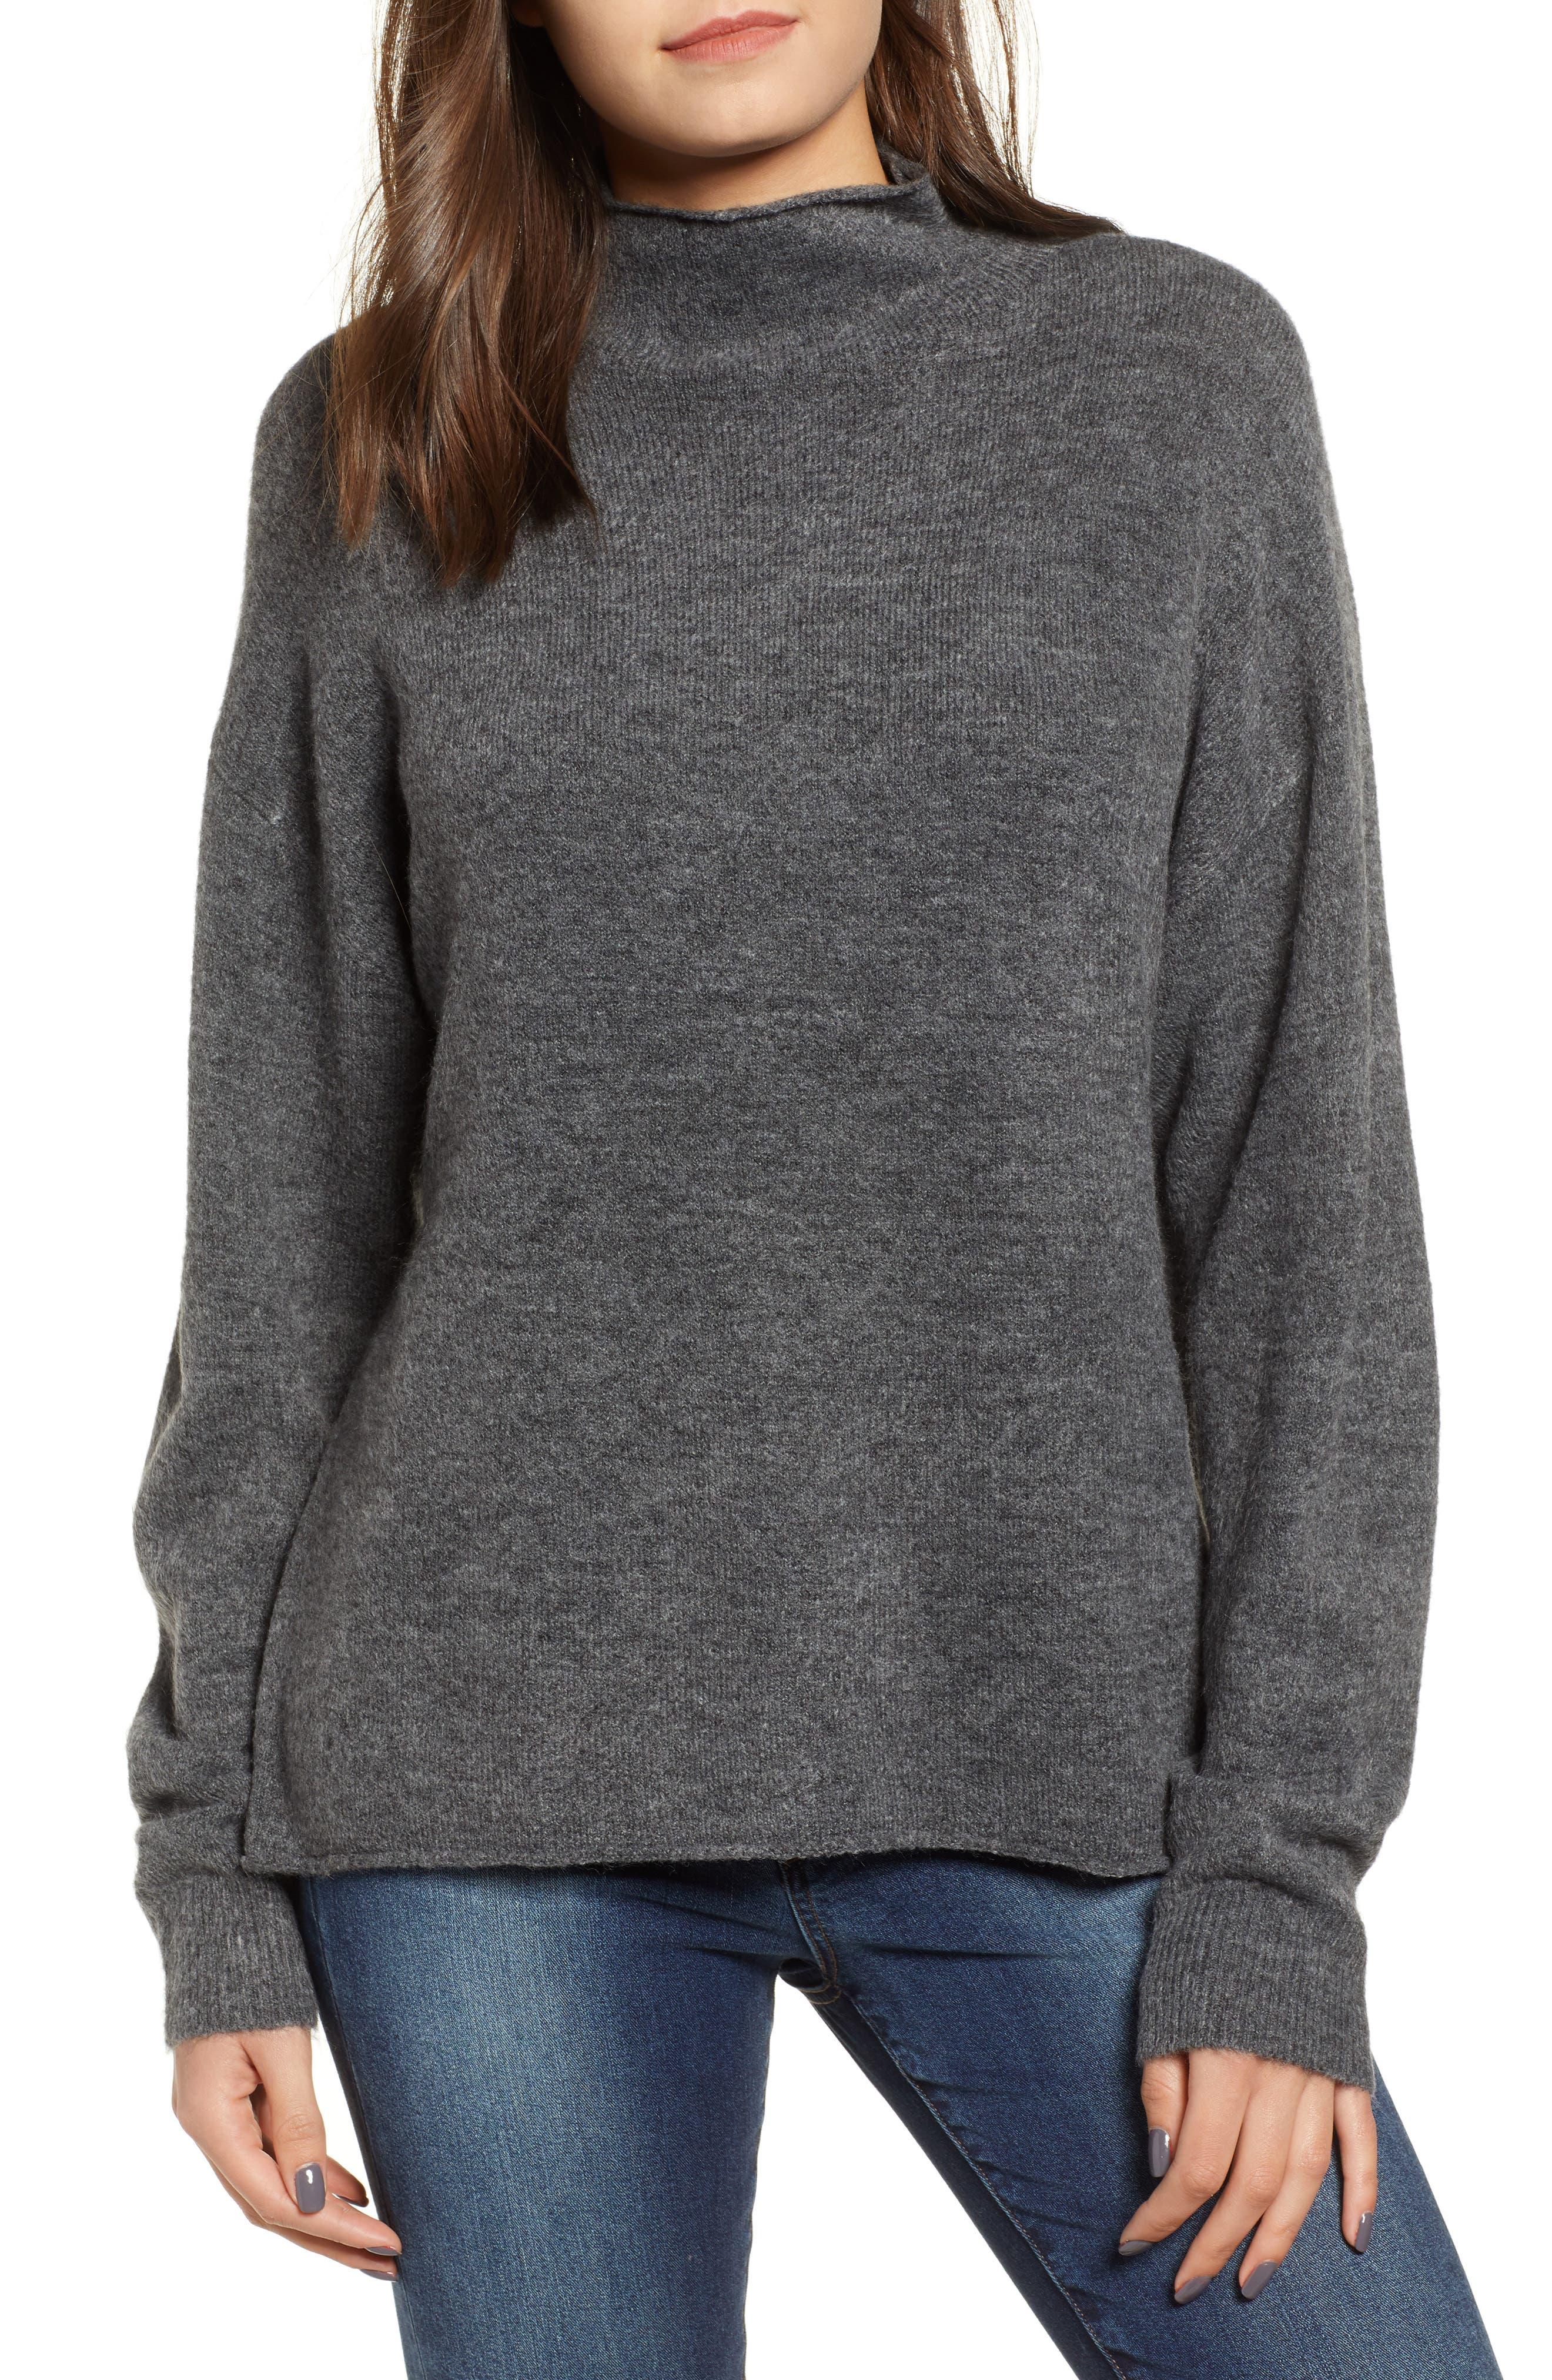 Cozy Mock Neck Sweater,                             Main thumbnail 1, color,                             GREY MEDIUM CHARCOAL HEATHER